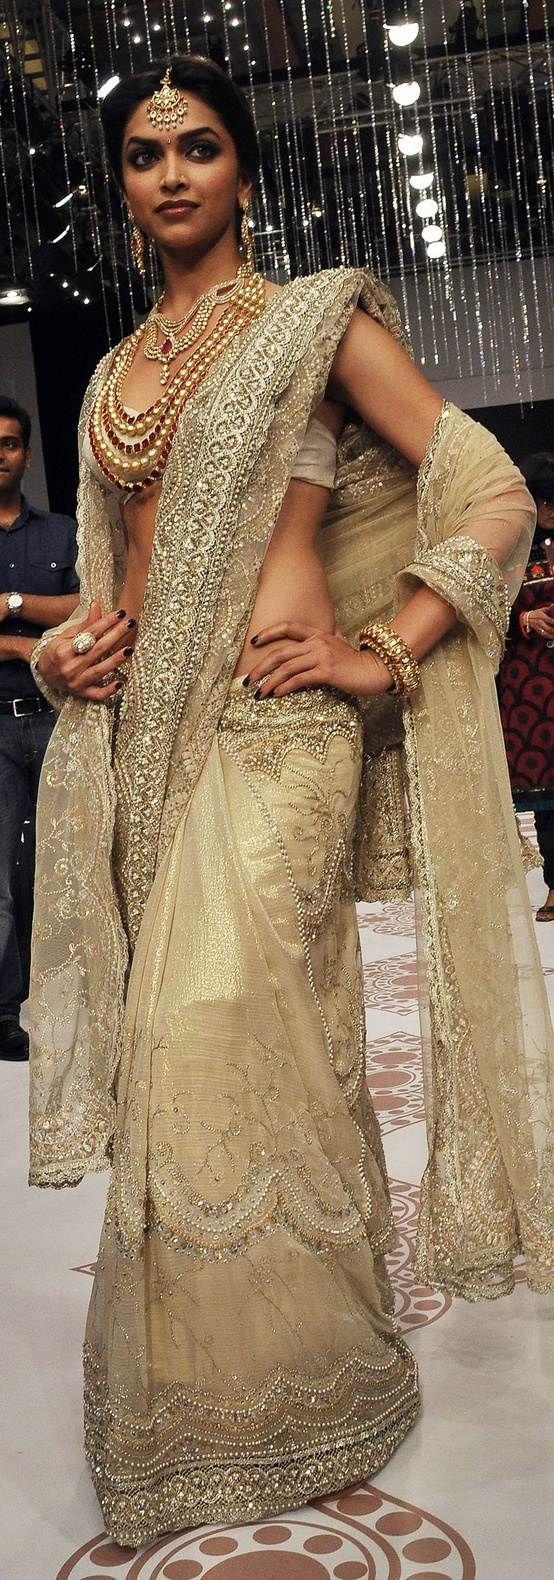 deepika padukone in Indian Bridal look